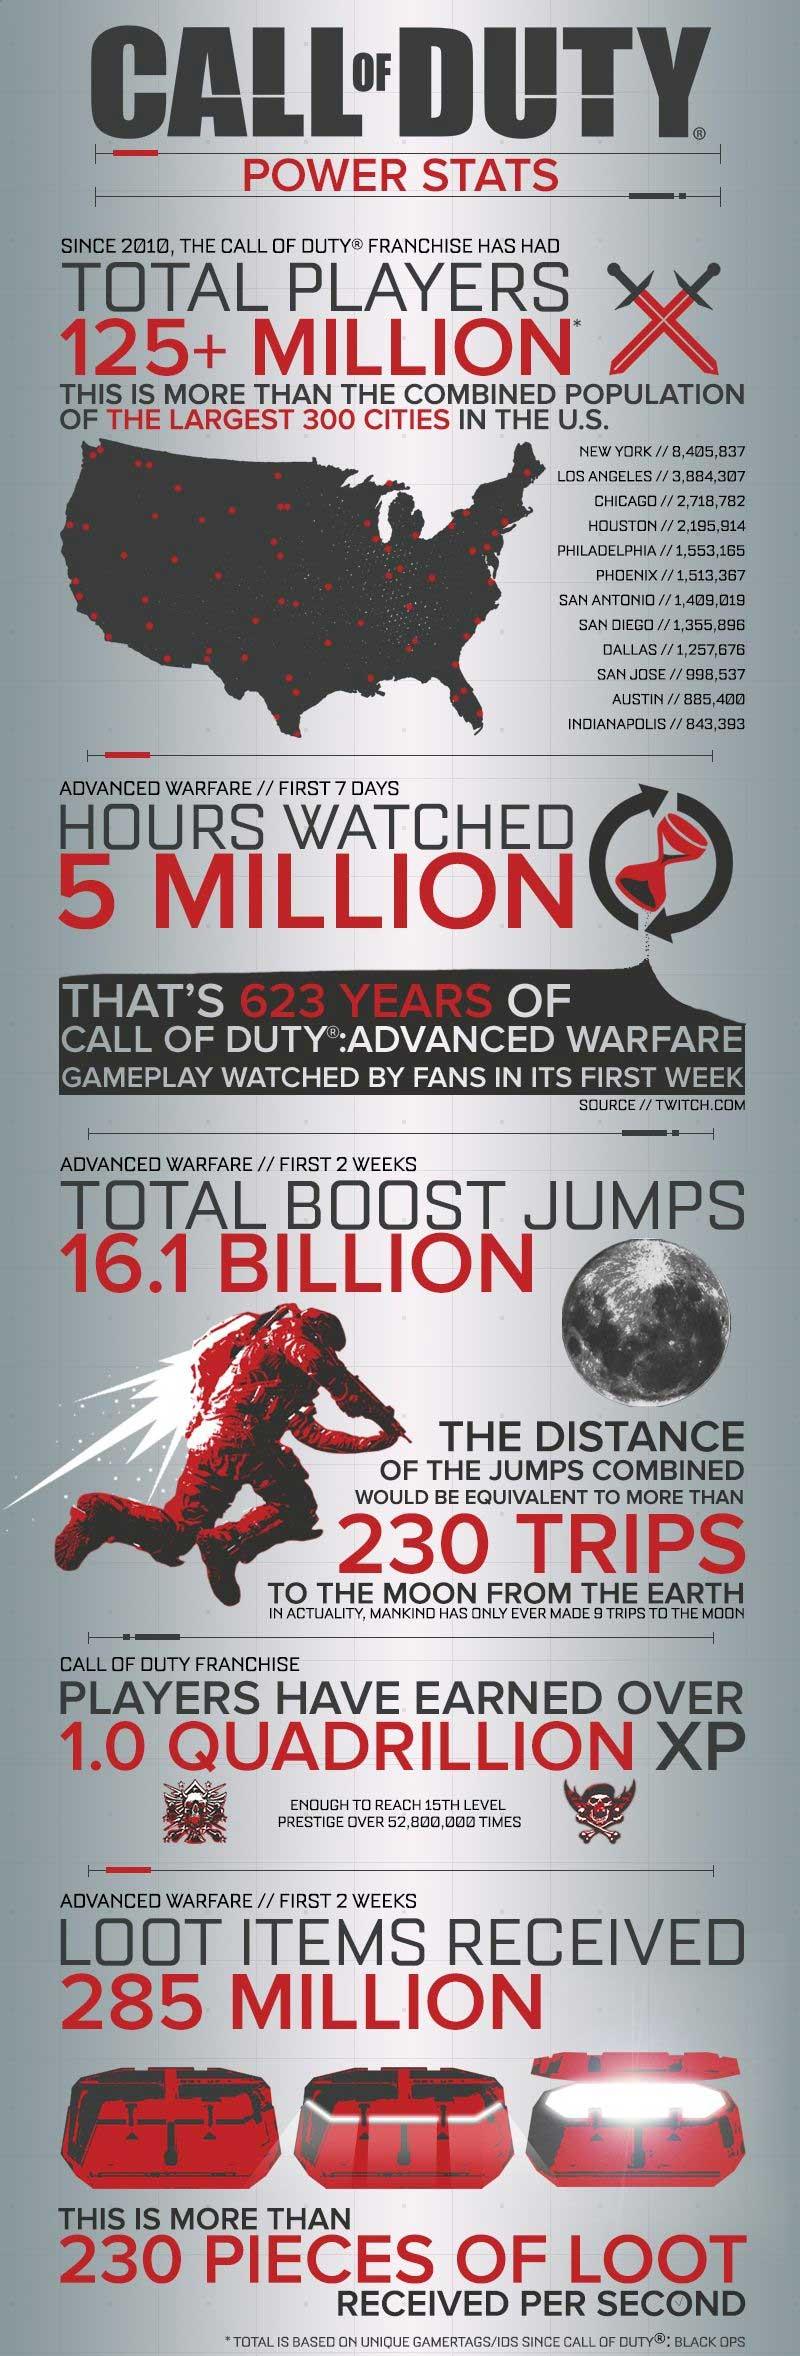 Call-of-Duty-statystyki